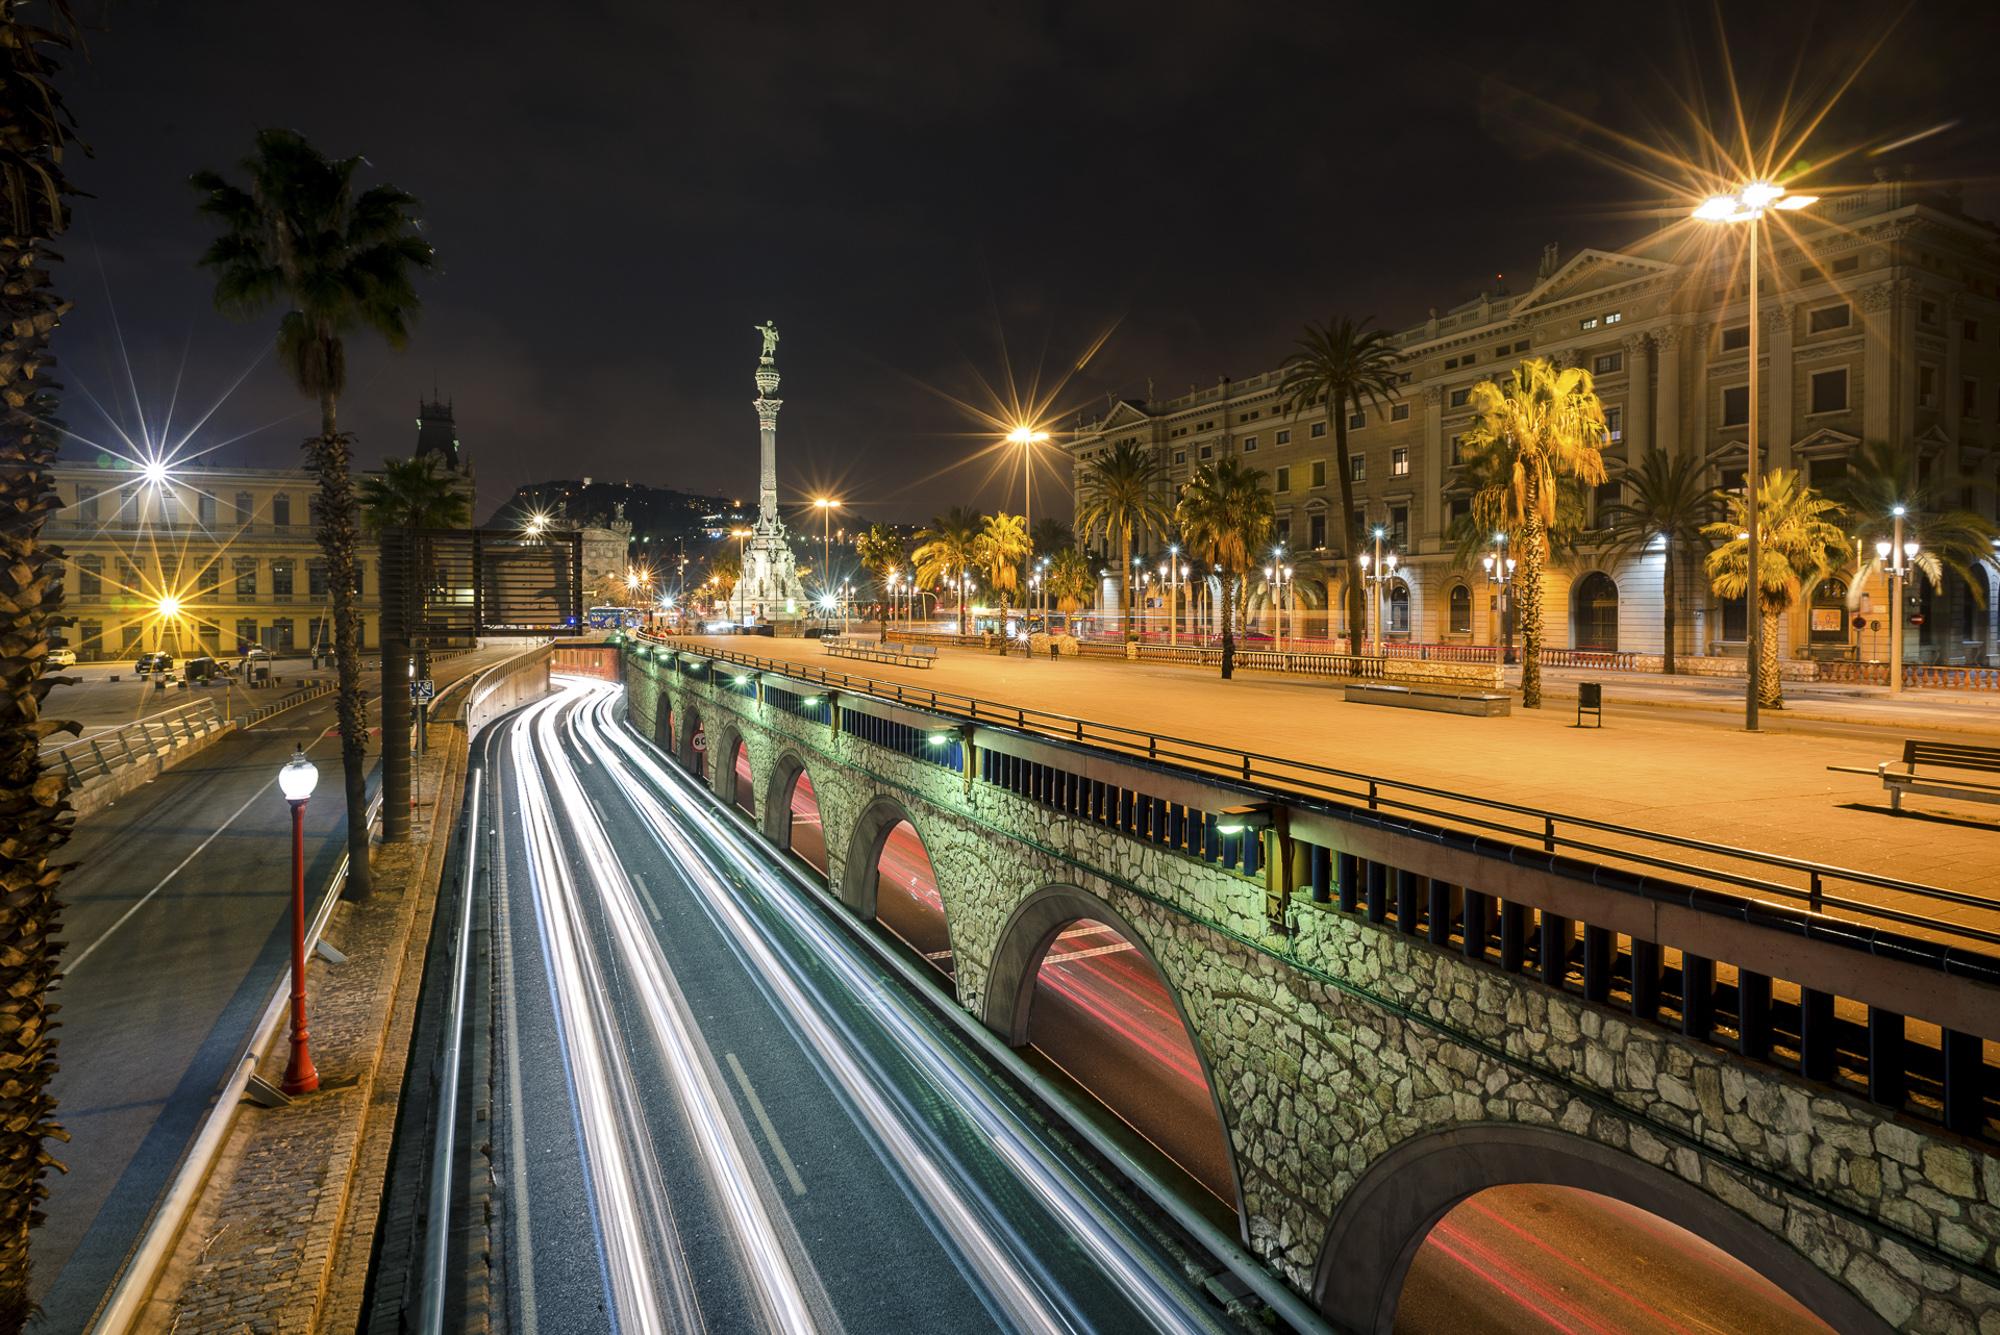 Barcelona-Gauvin-007-aperture-tours.jpg